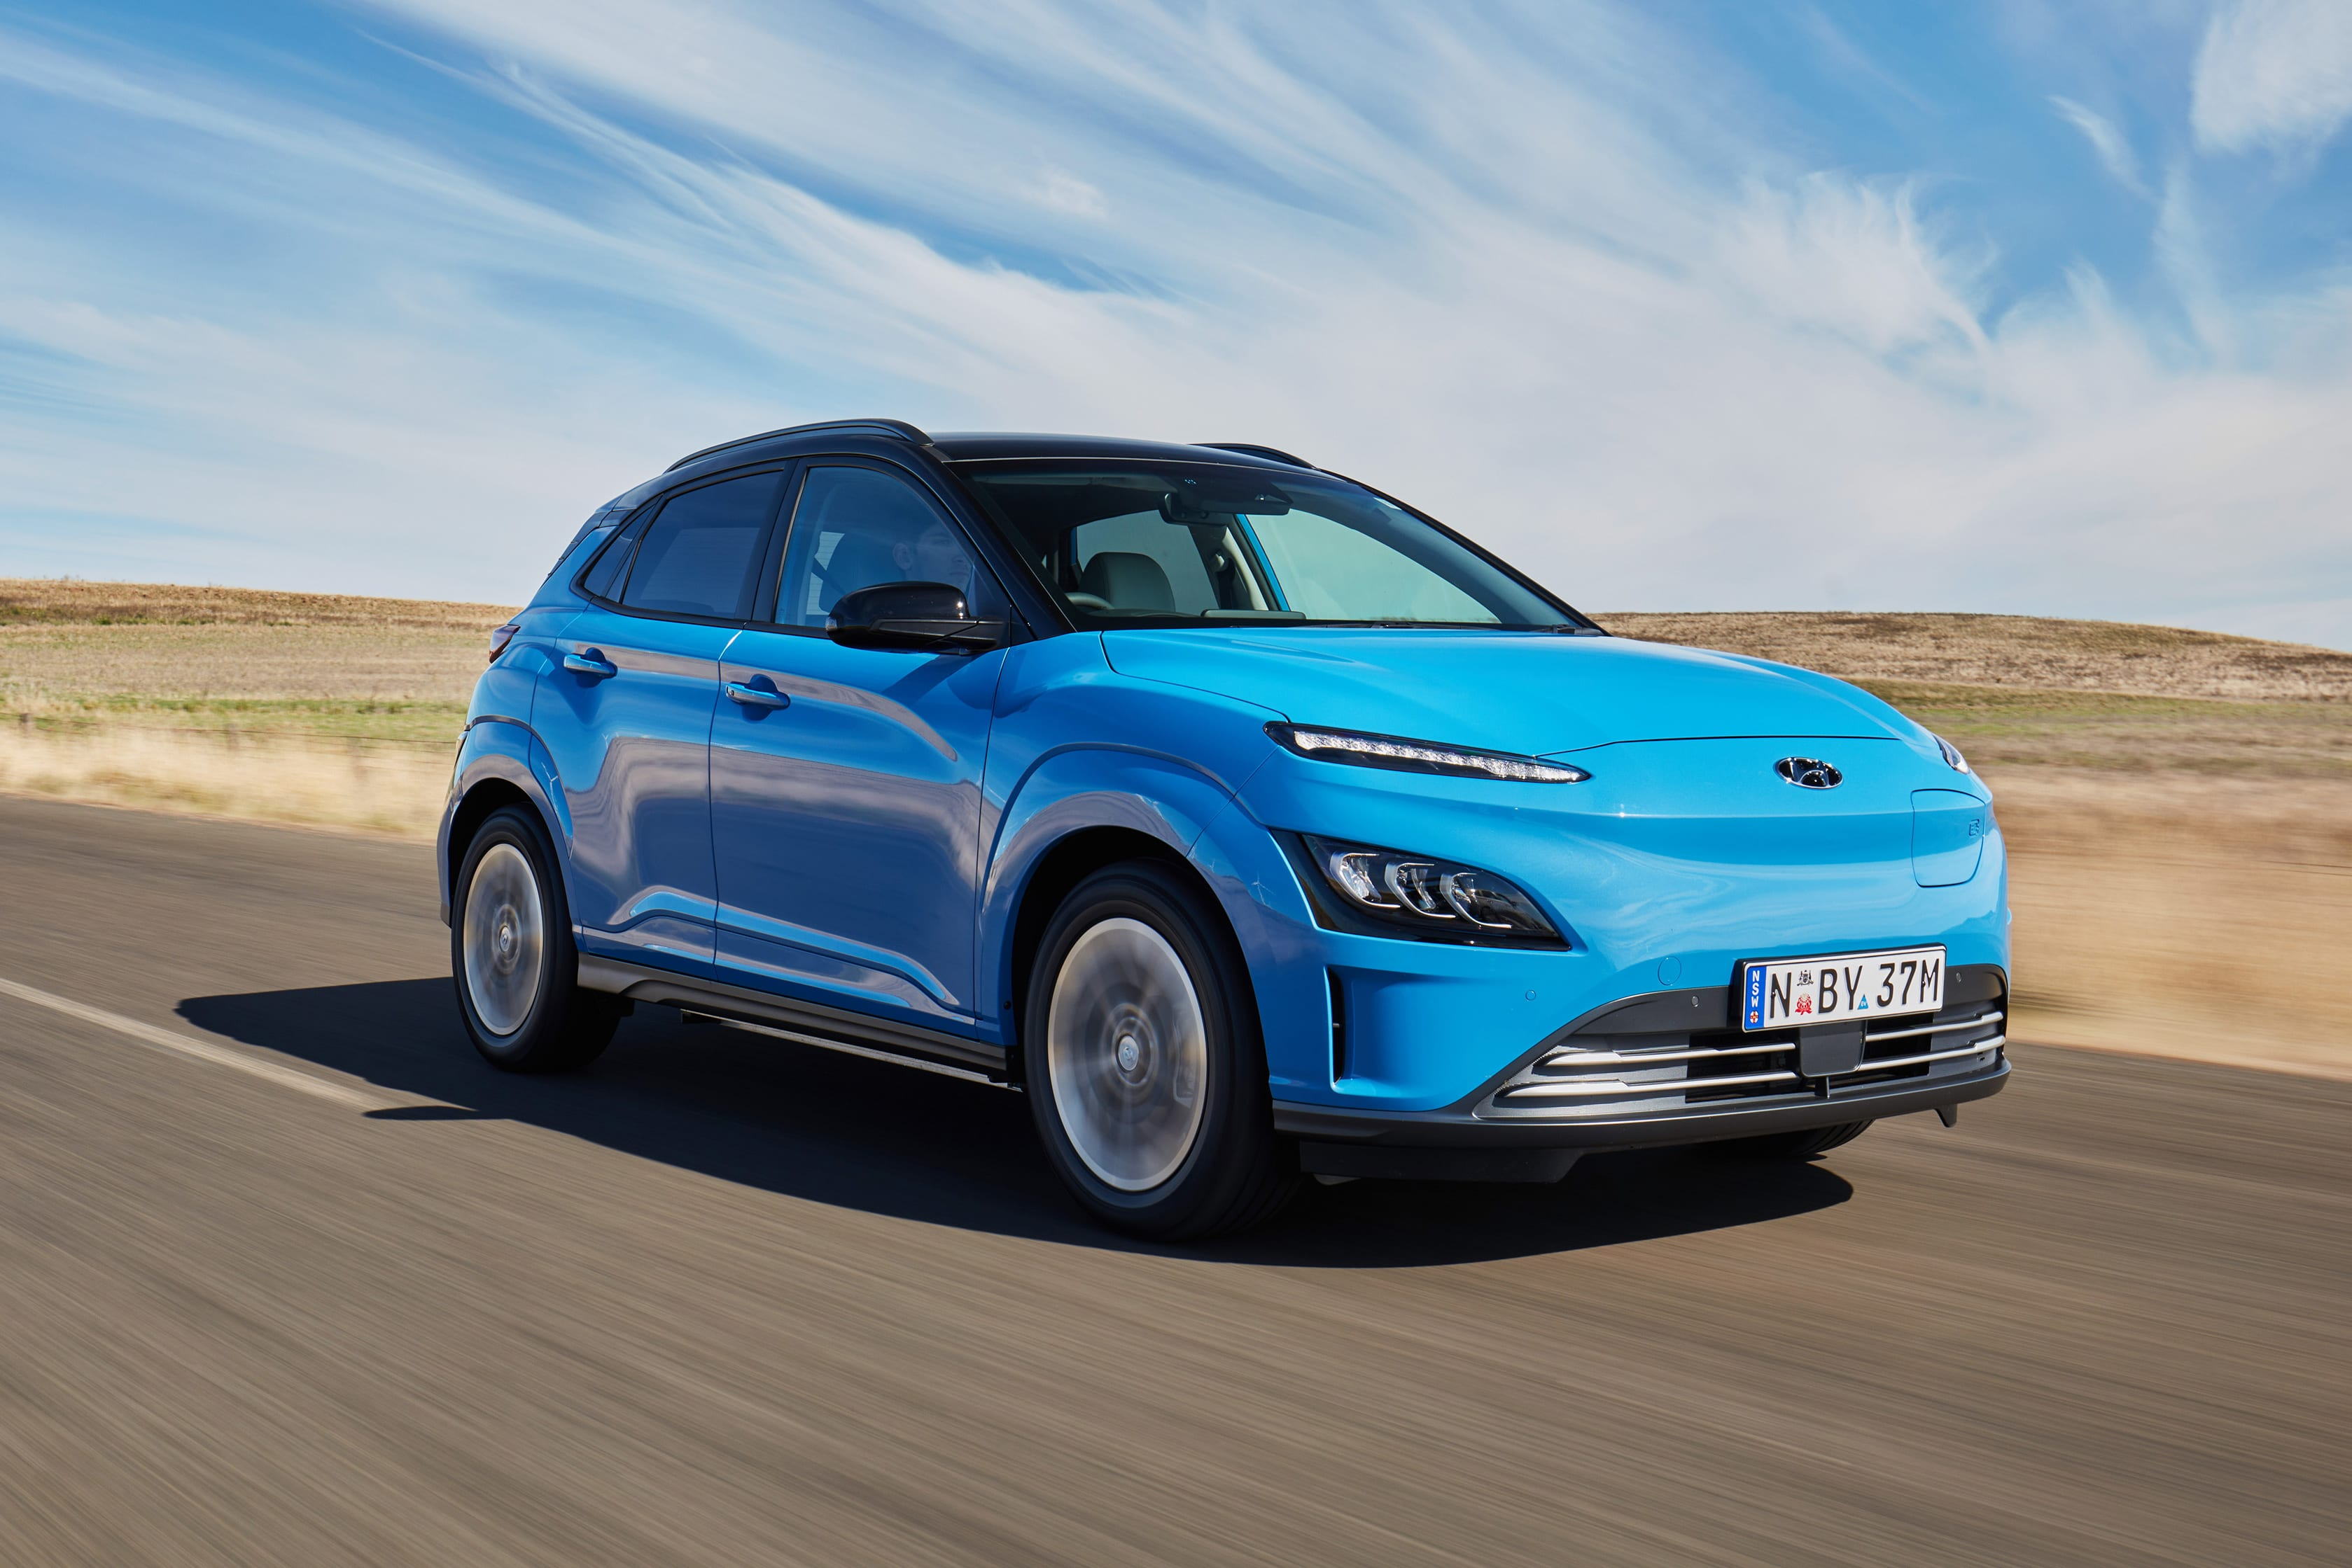 2021 Hyundai Kona Electric Highlander test drive review